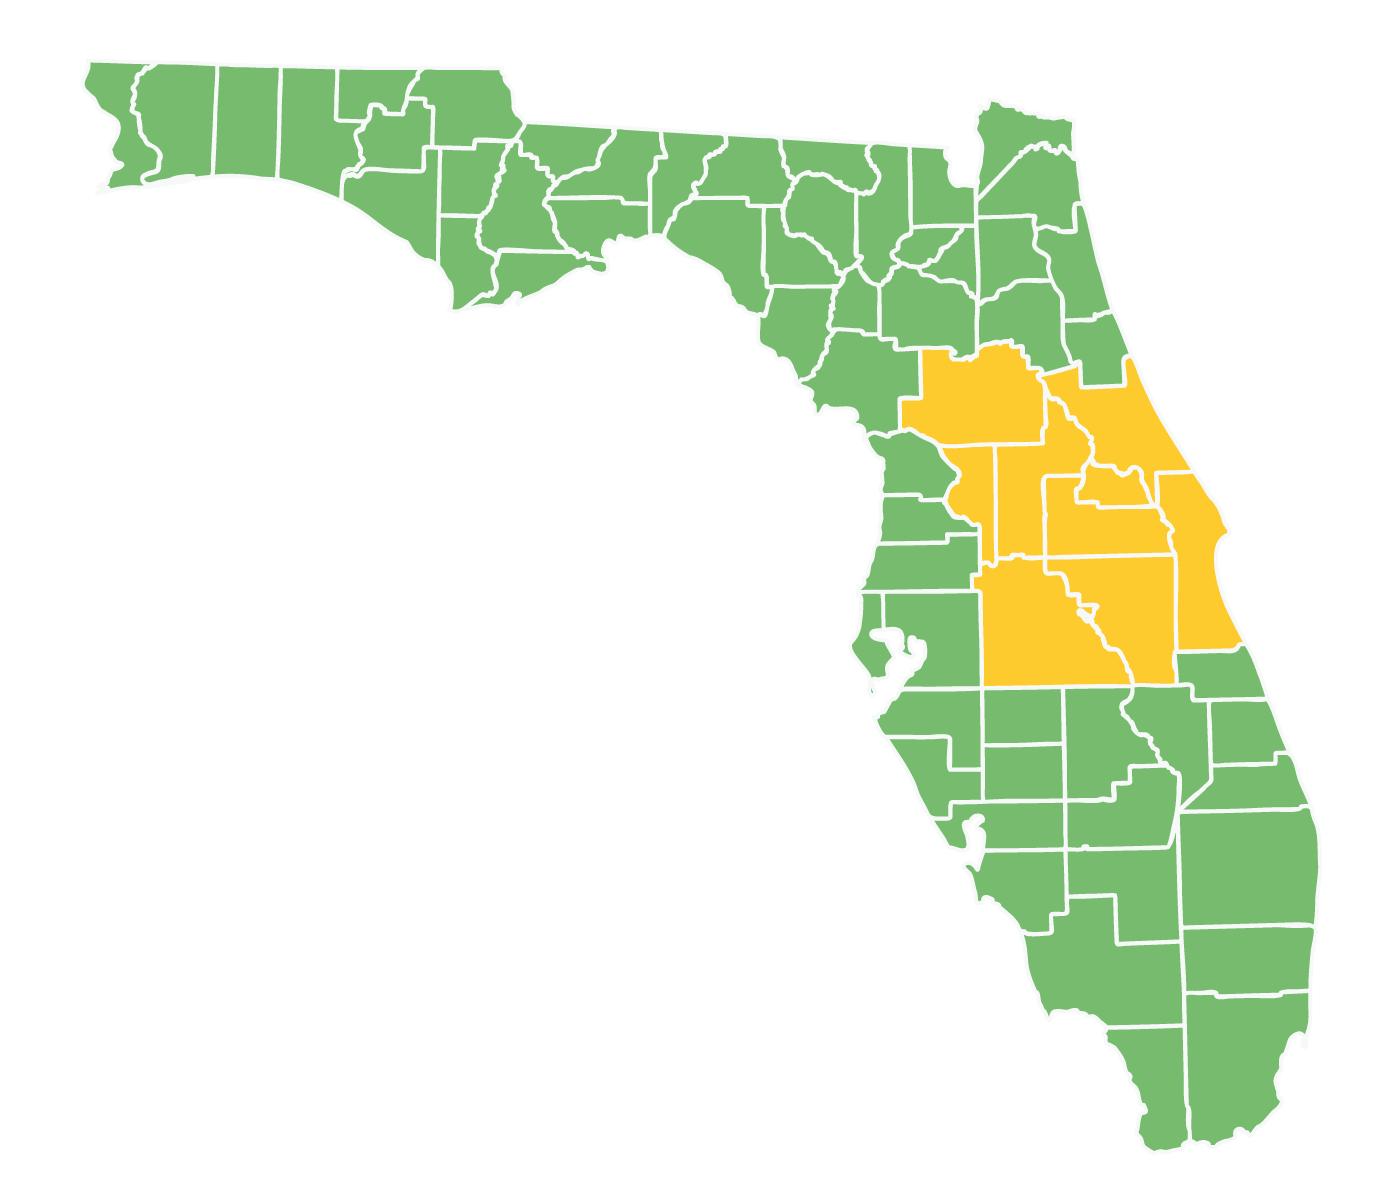 cai-central-florida-map